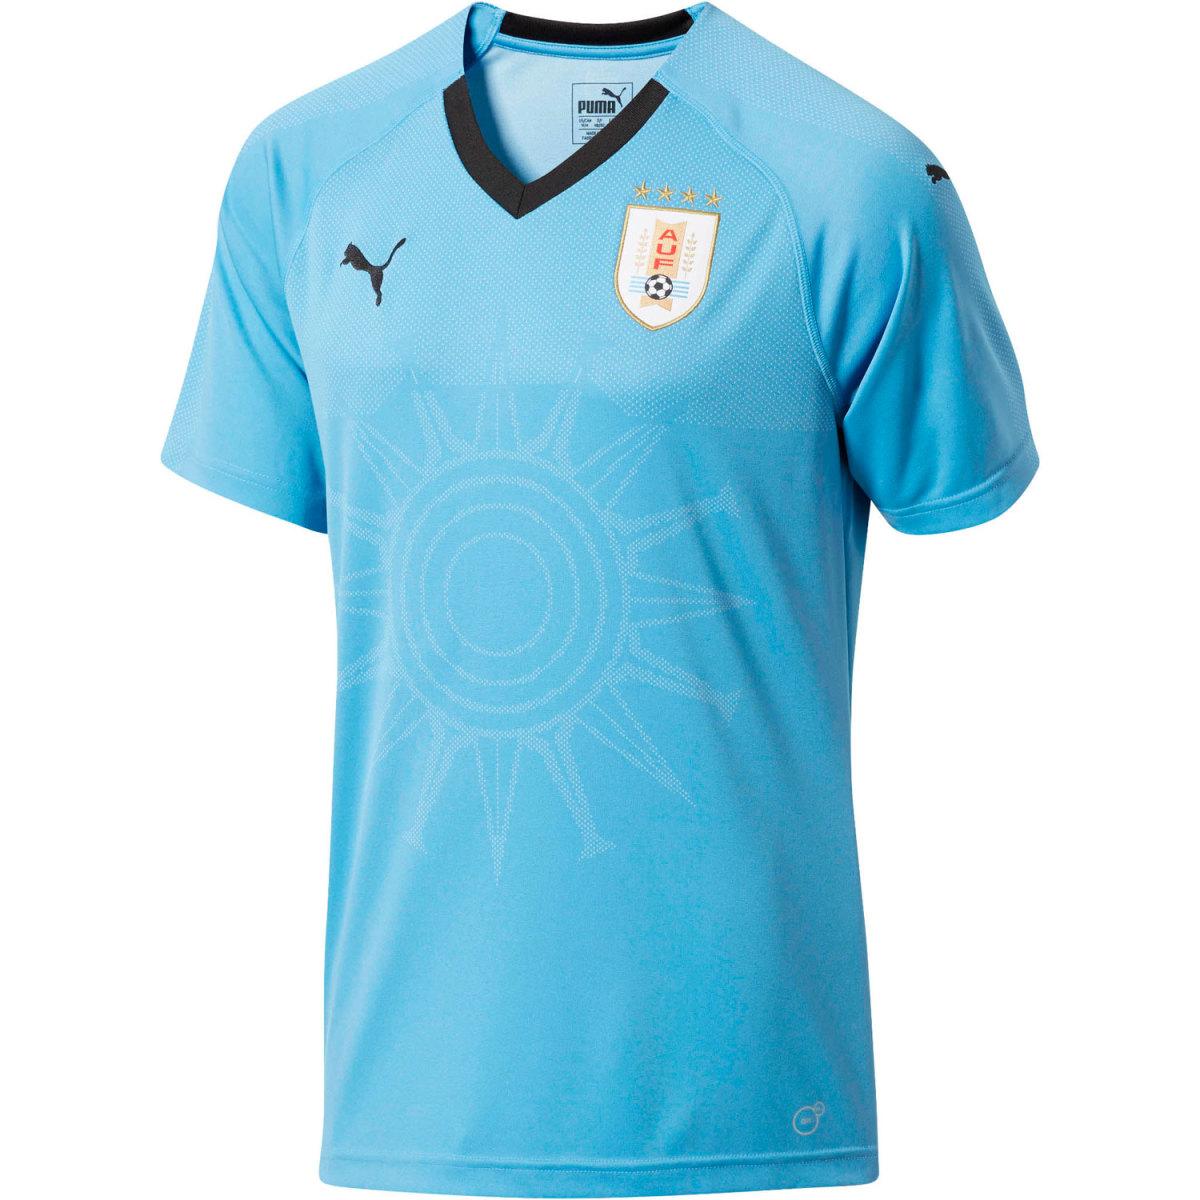 Uruguay-2018-WC-Puma.jpg